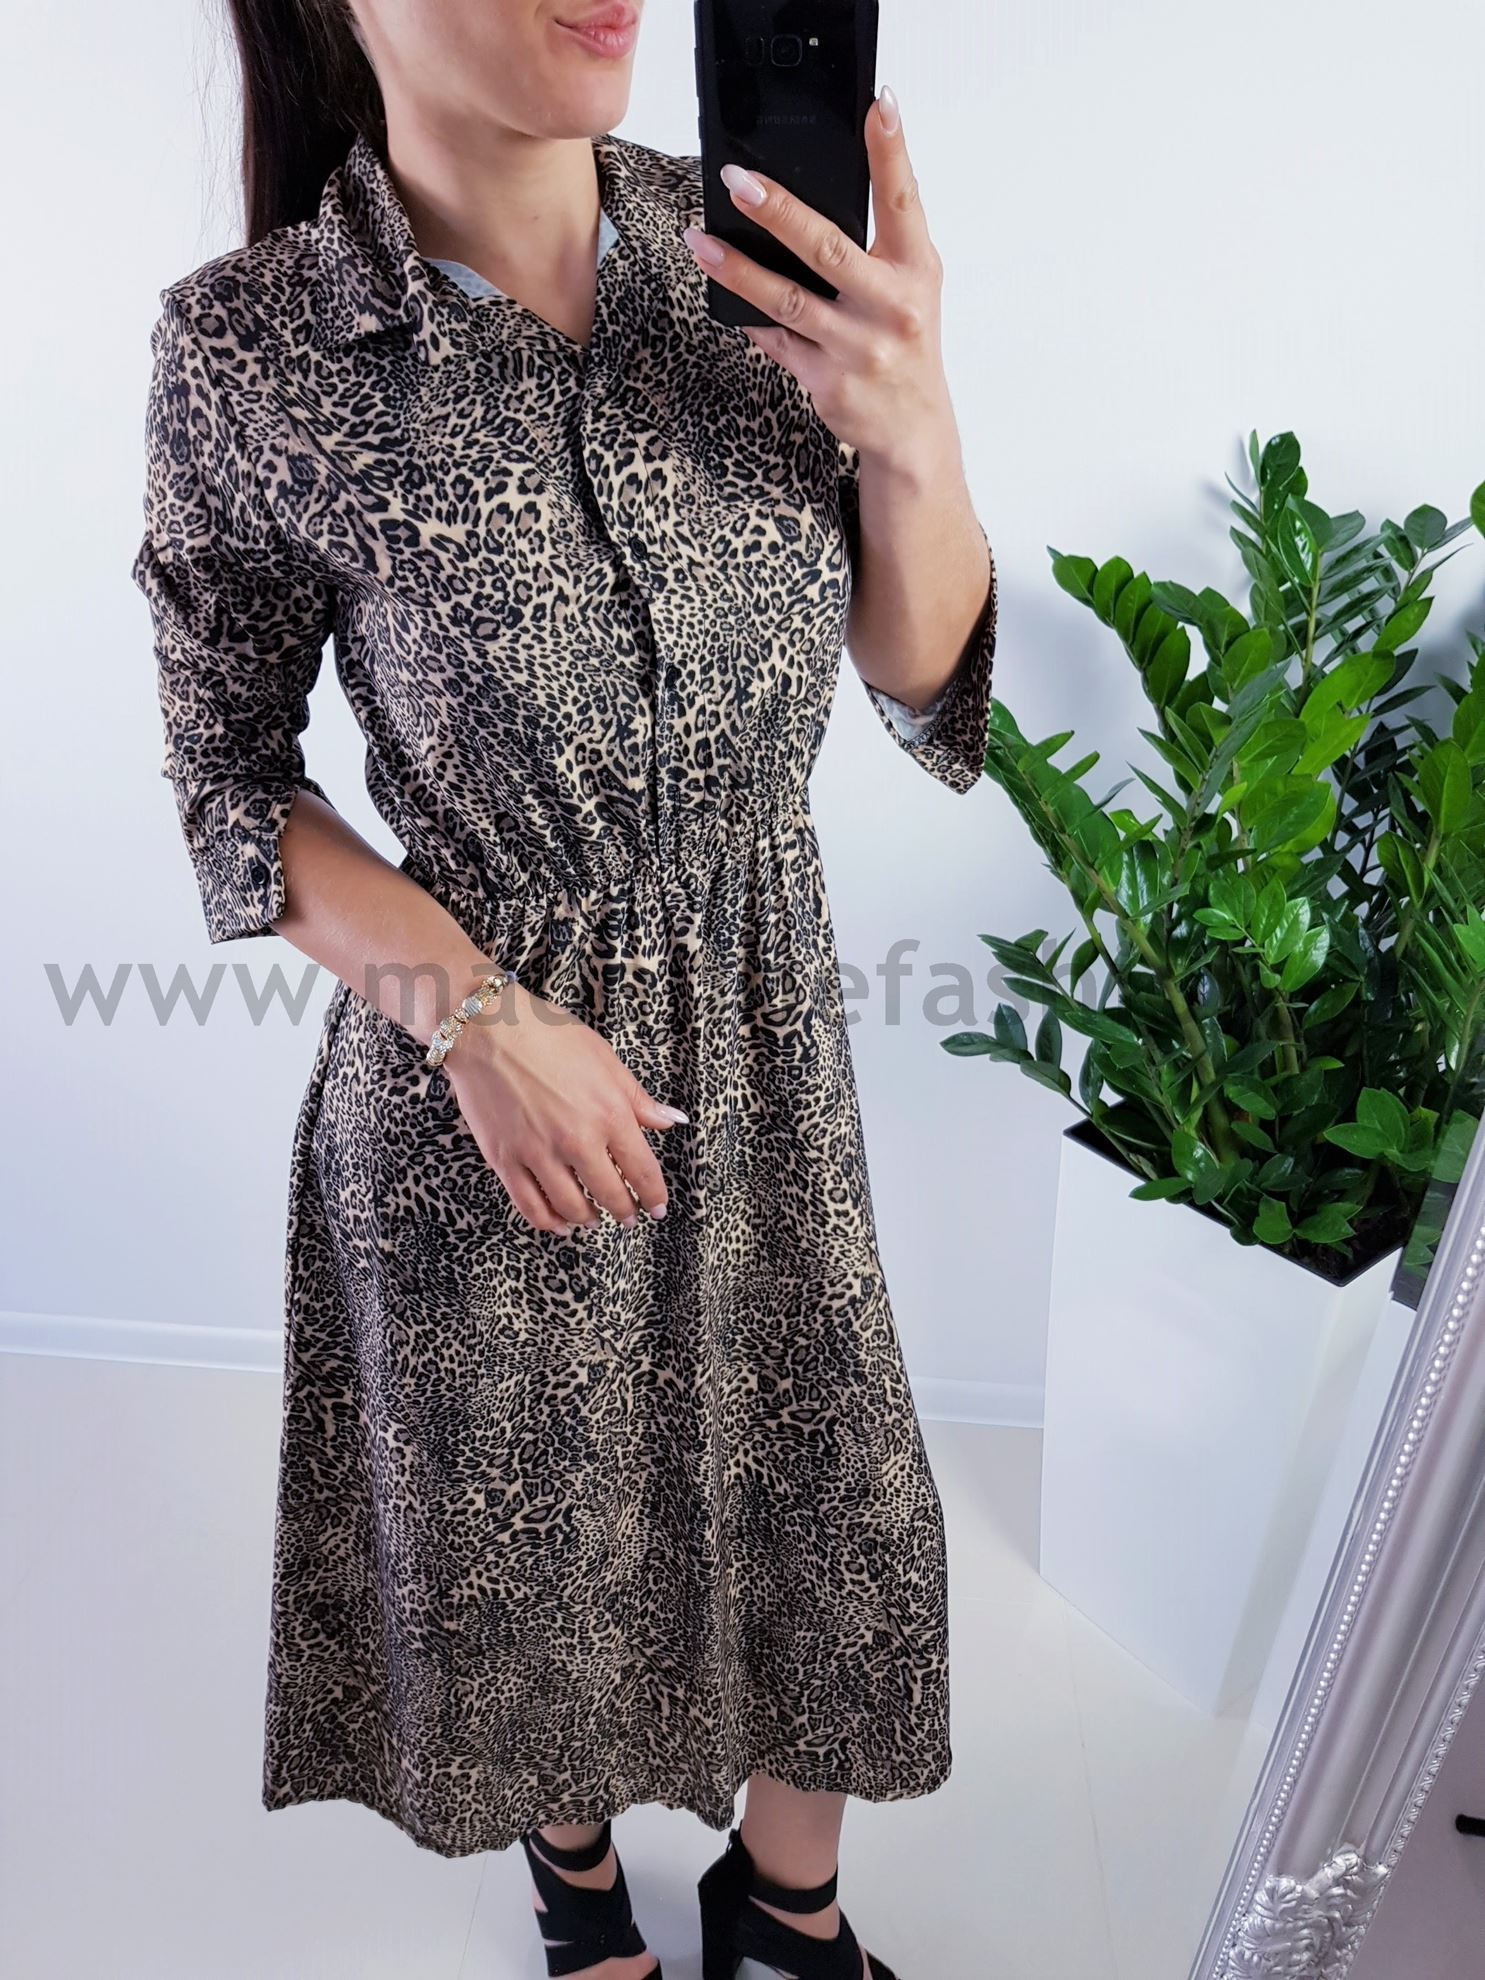 products 0003976 sukienka gepard